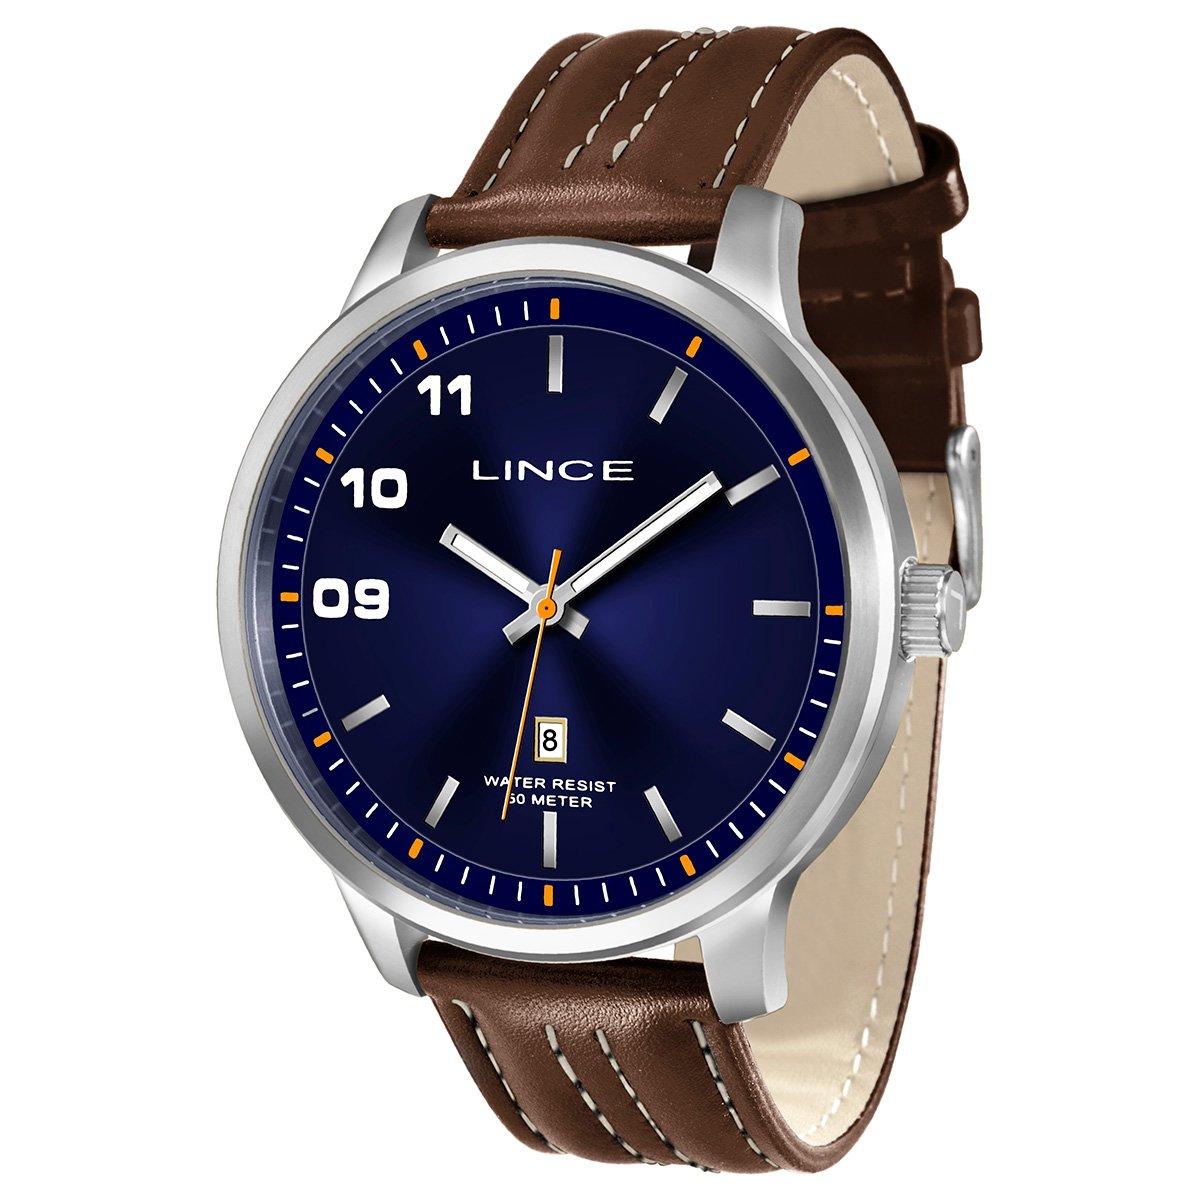 4d5424dd608 Relógio Lince Analógico MRCH031S-D2NB Masculino - Compre Agora ...